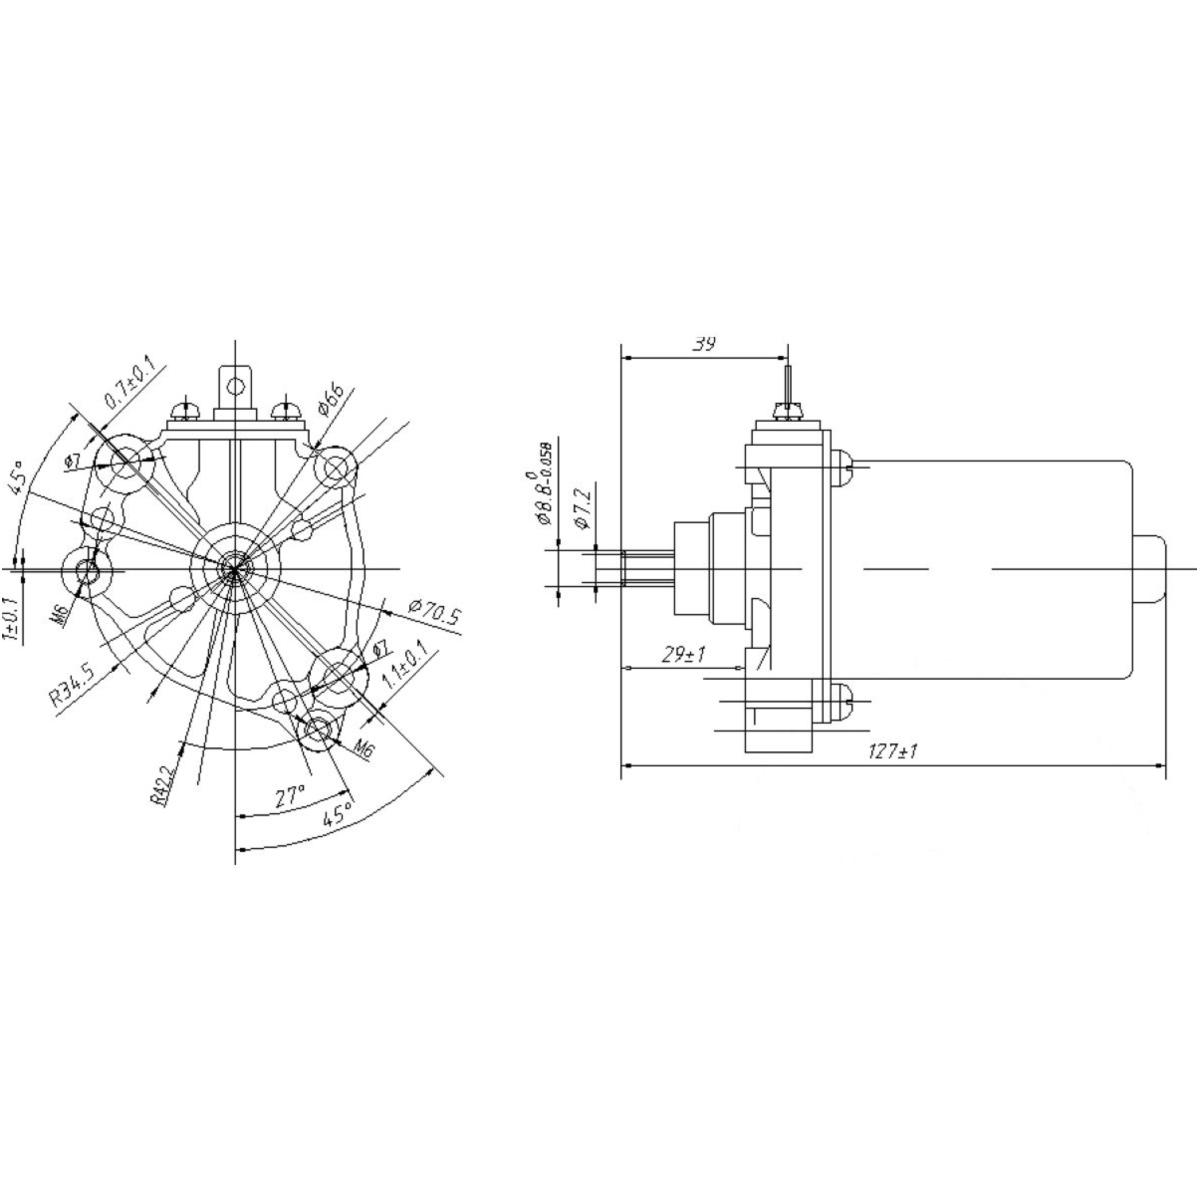 hight resolution of toyotum 2t engine diagram